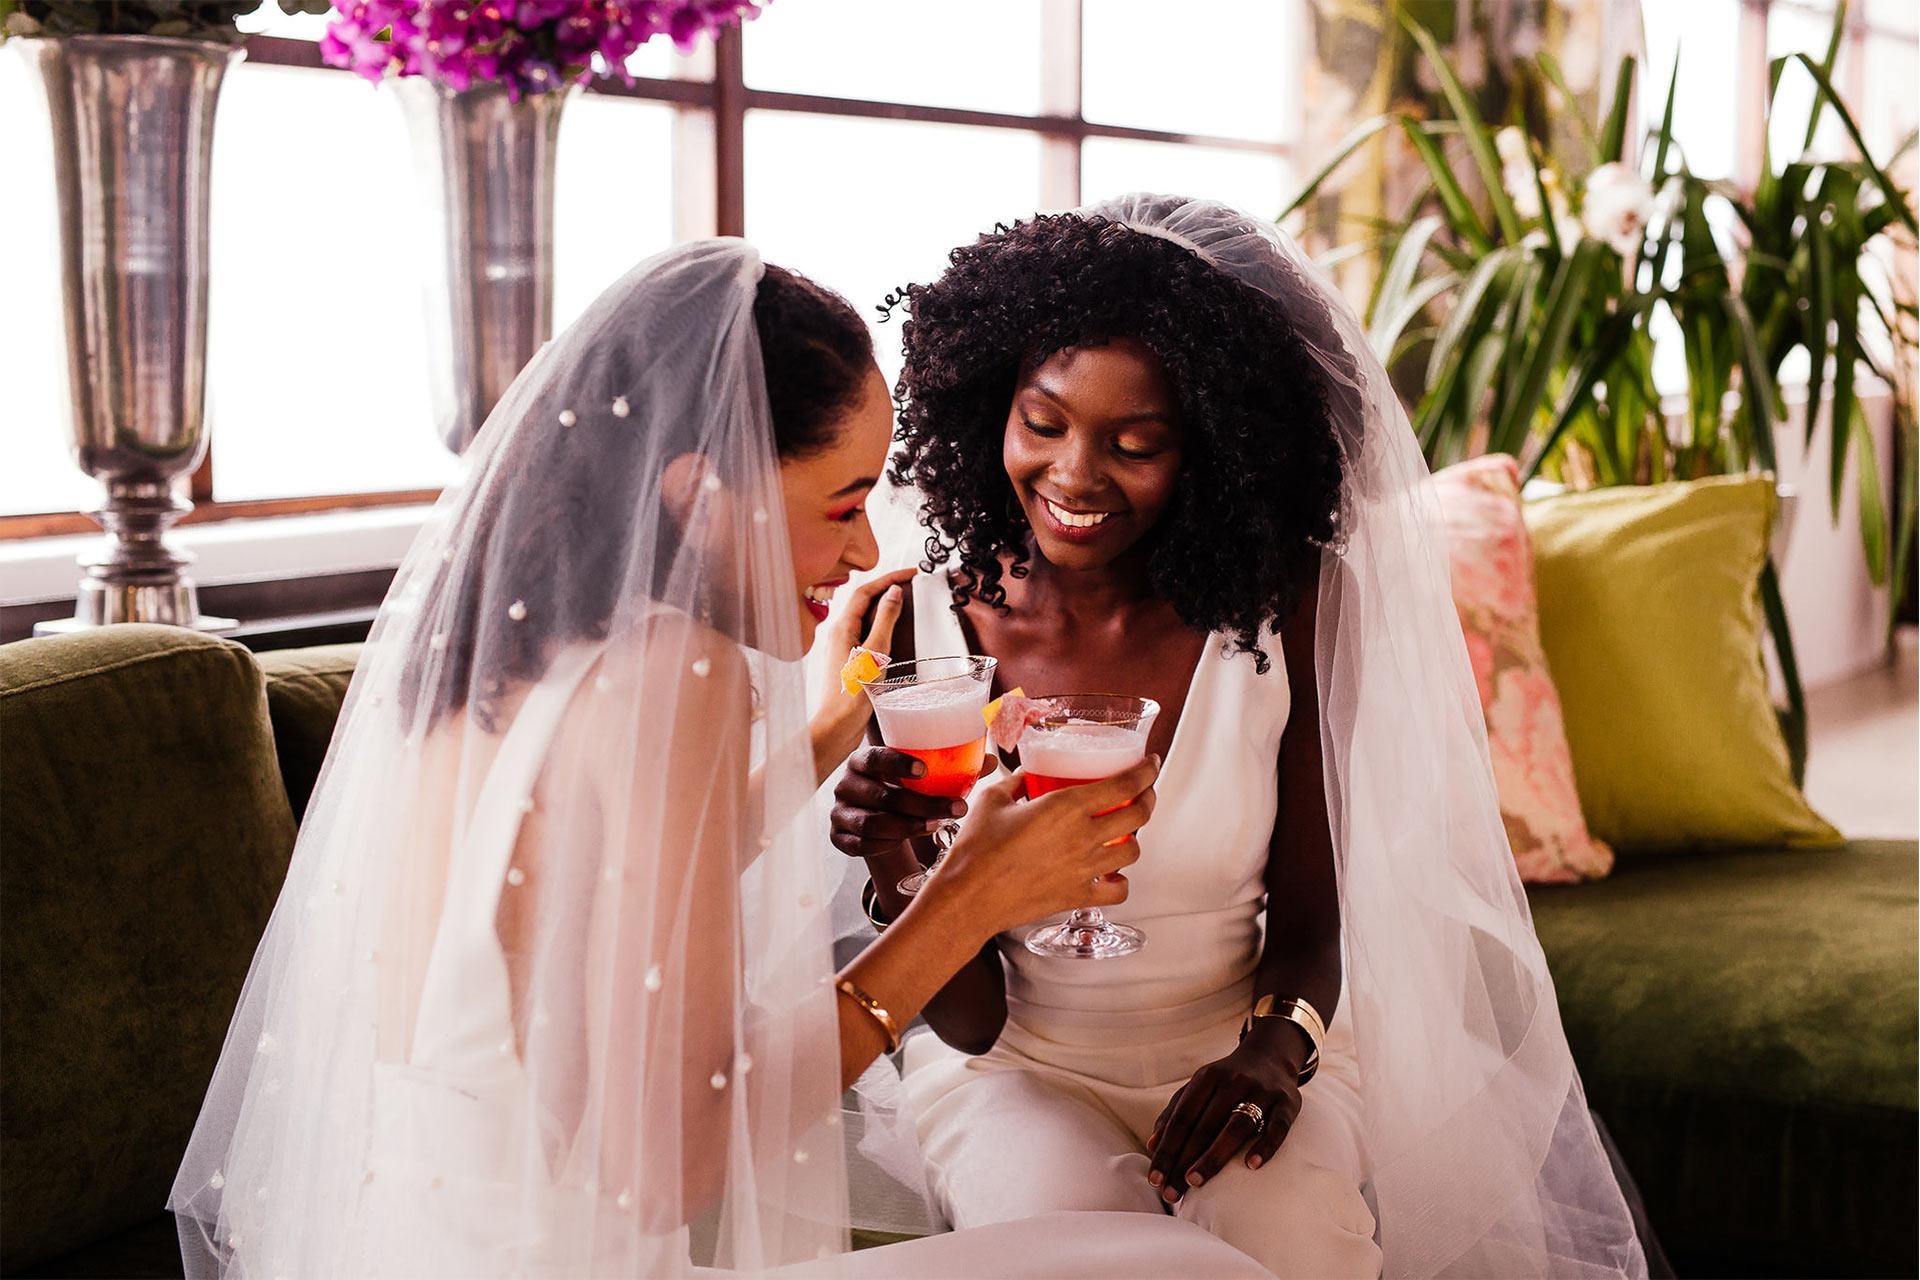 Two brides enjoying a wedding cocktail on their wedding day